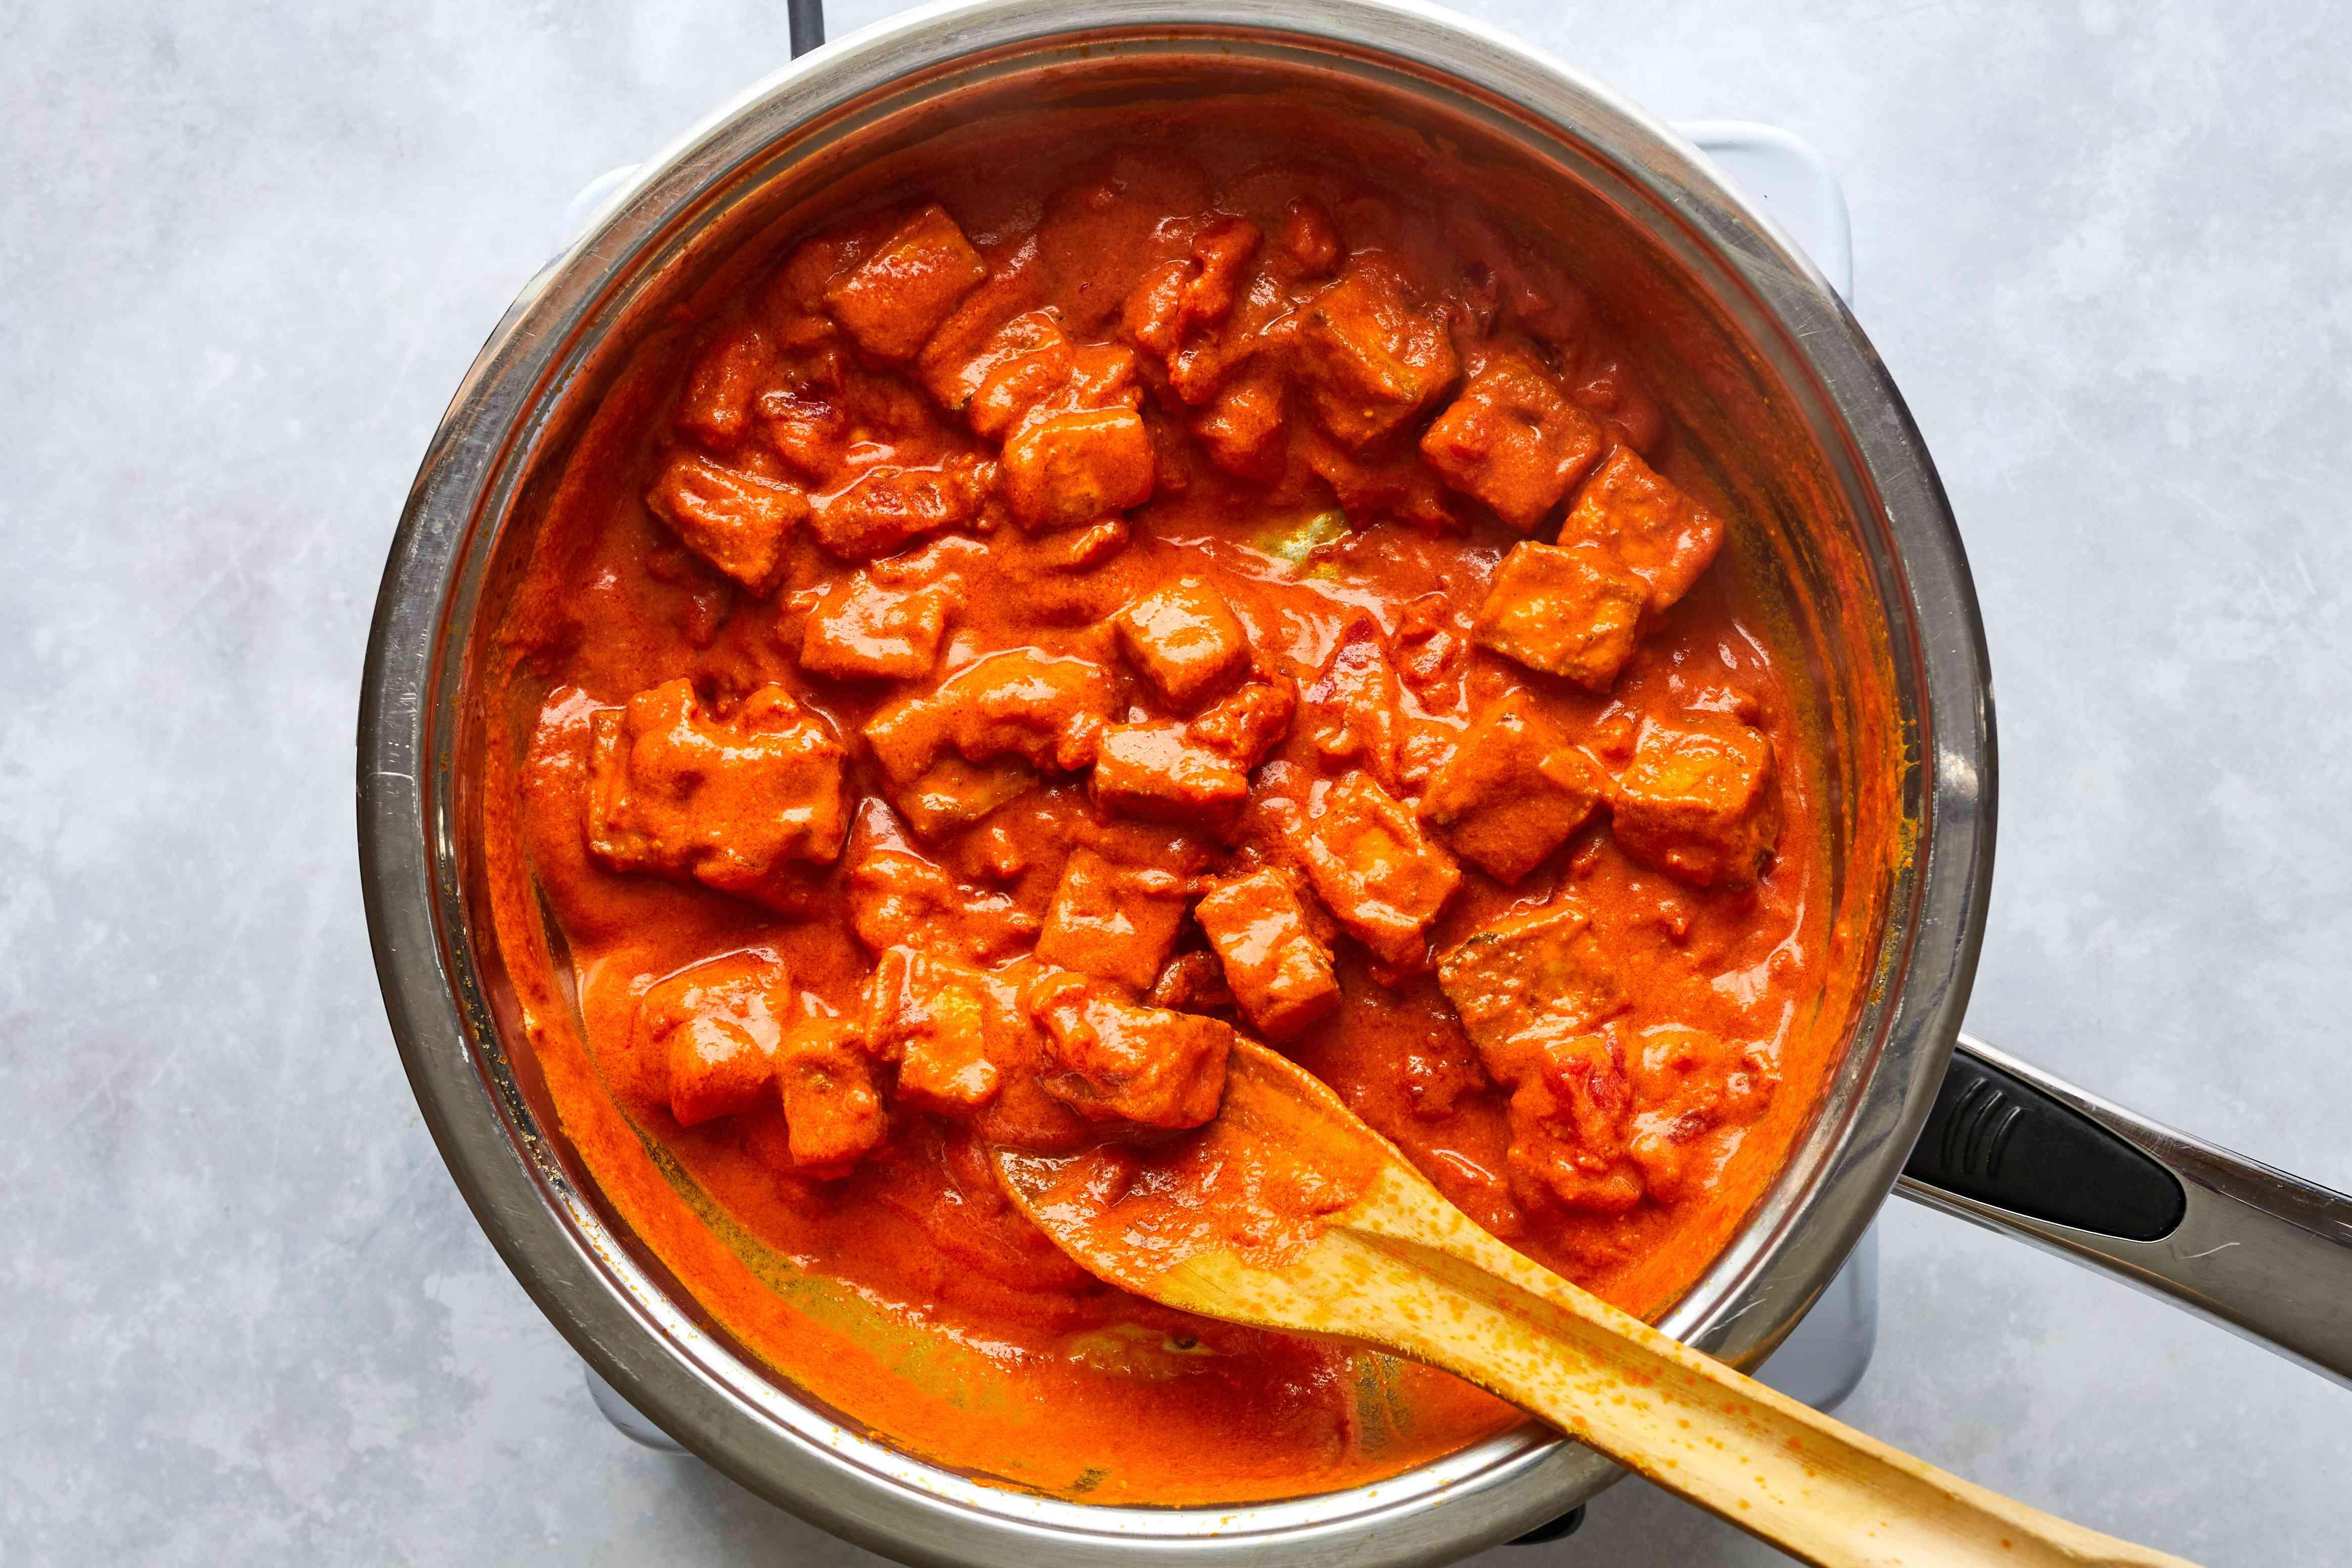 Add tofu to skillet